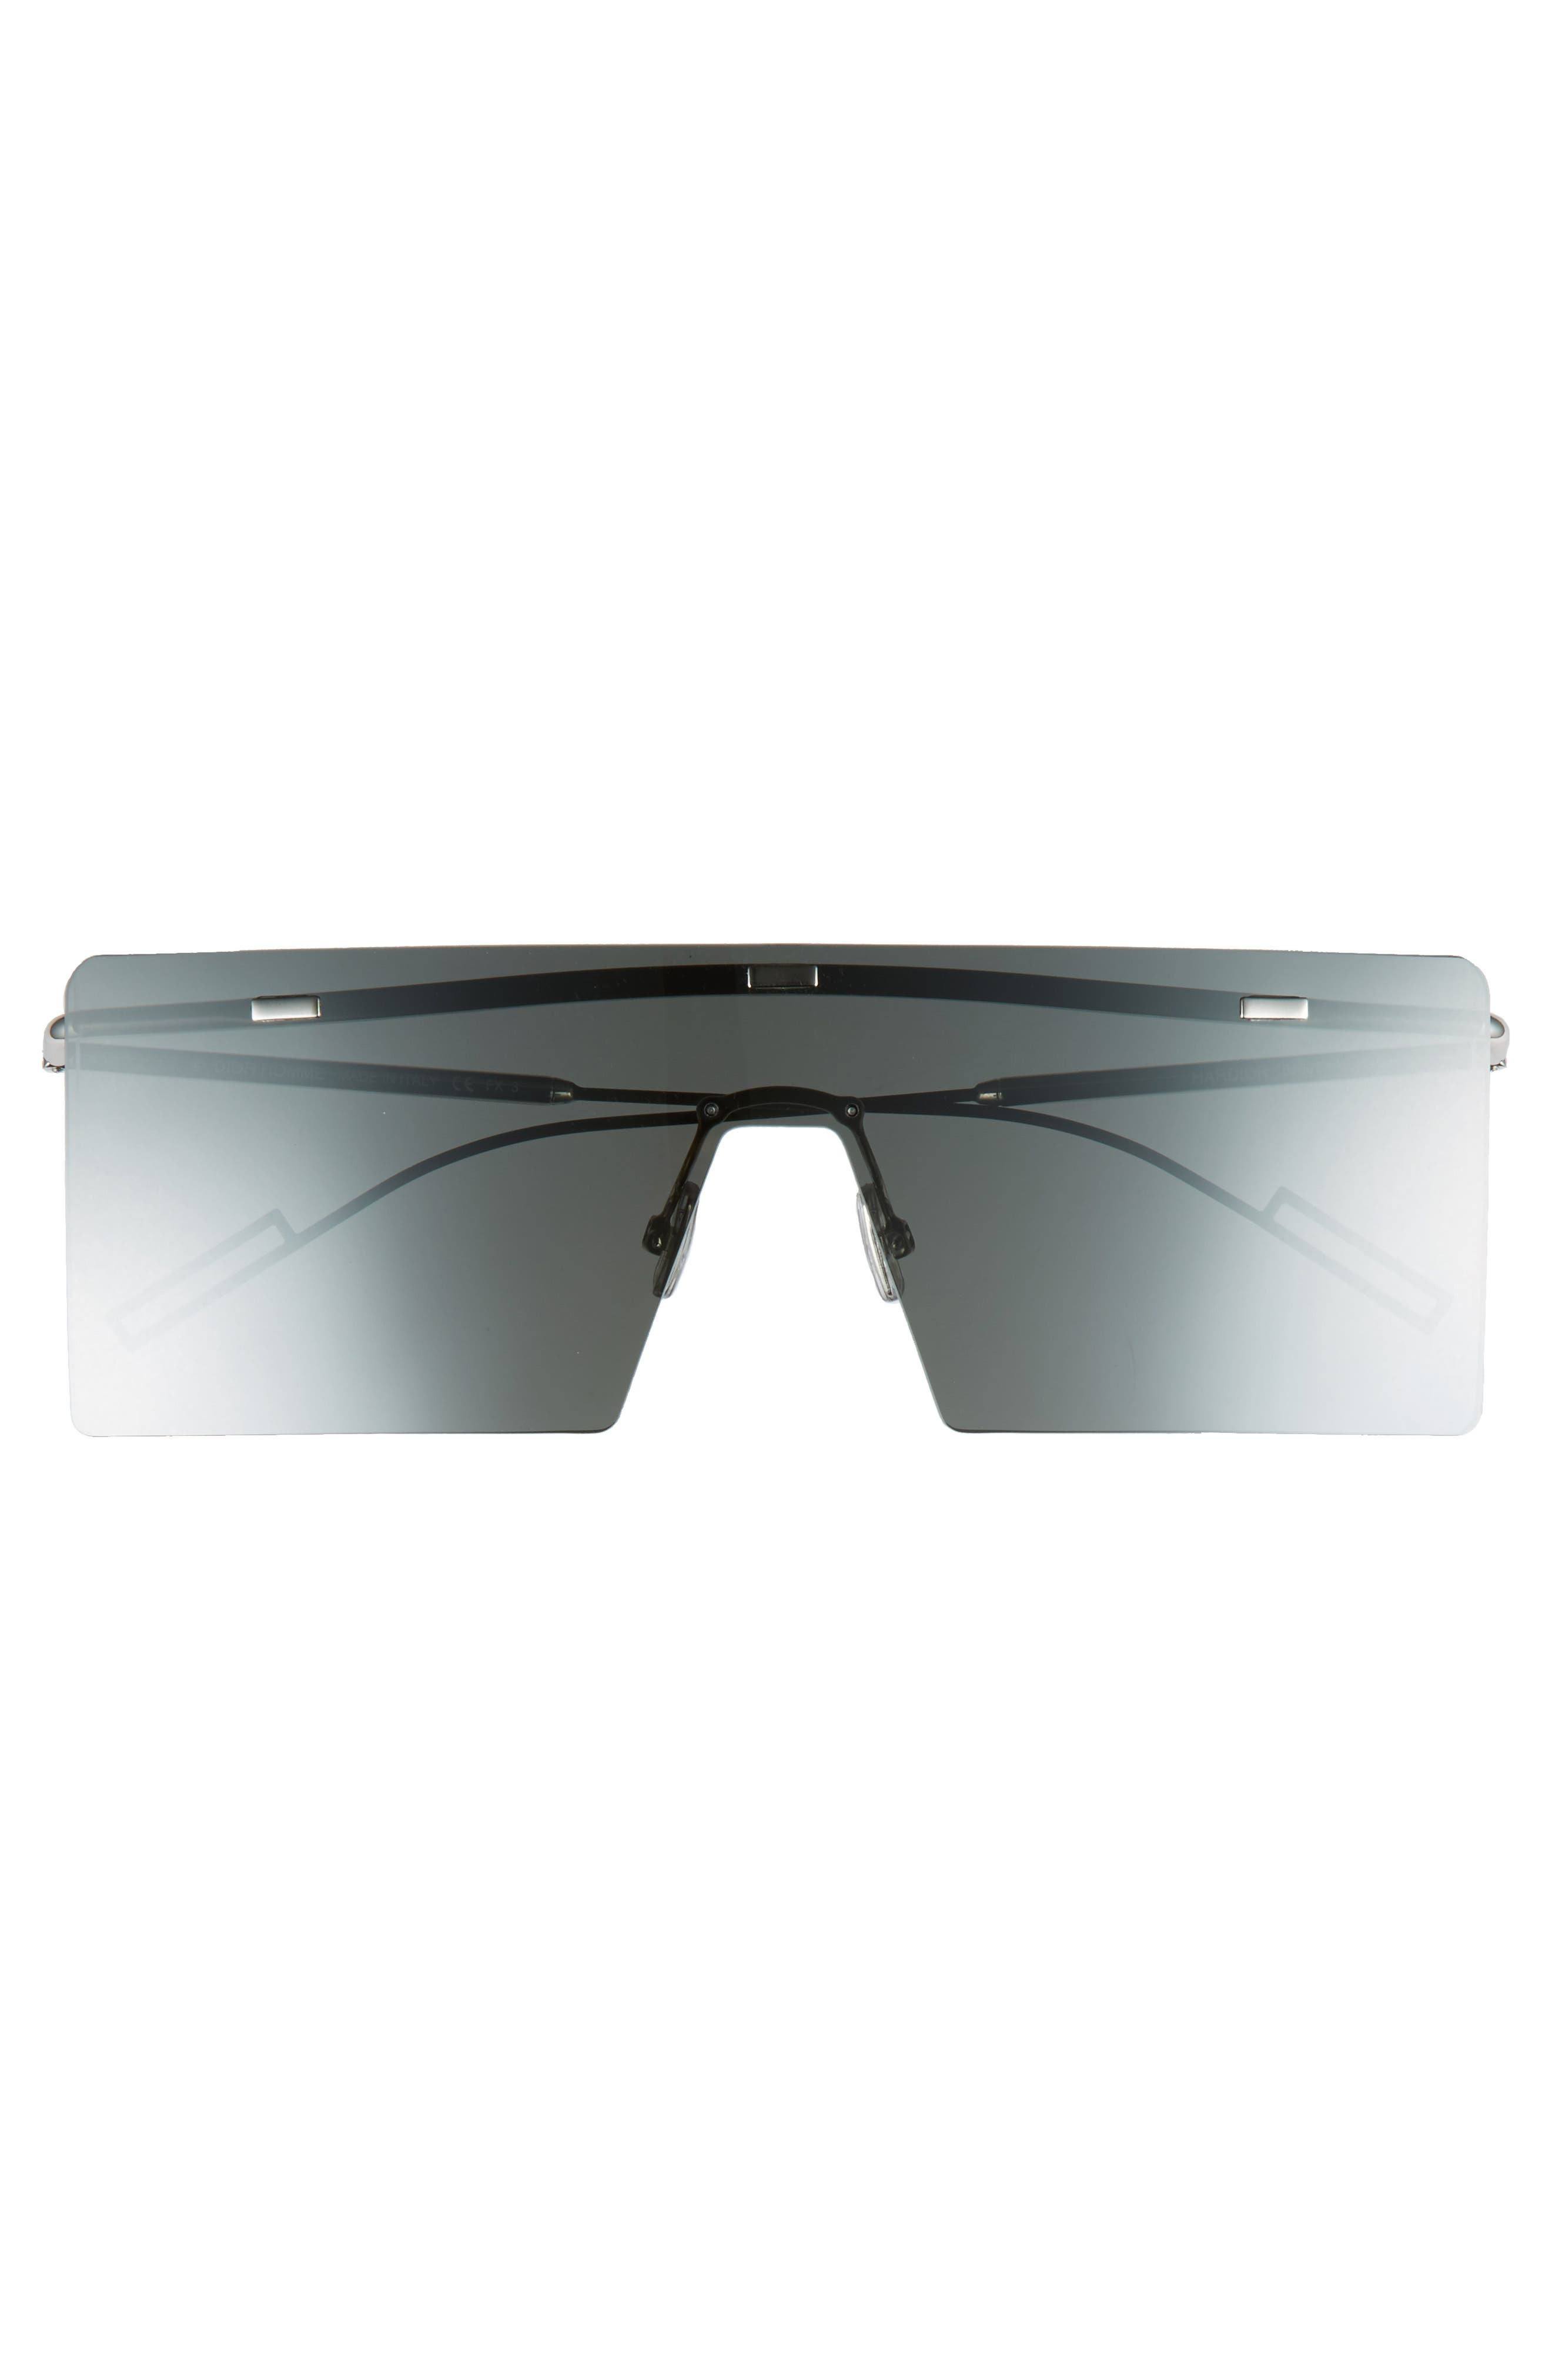 Hardior 65mm Sunglasses,                             Alternate thumbnail 2, color,                             041